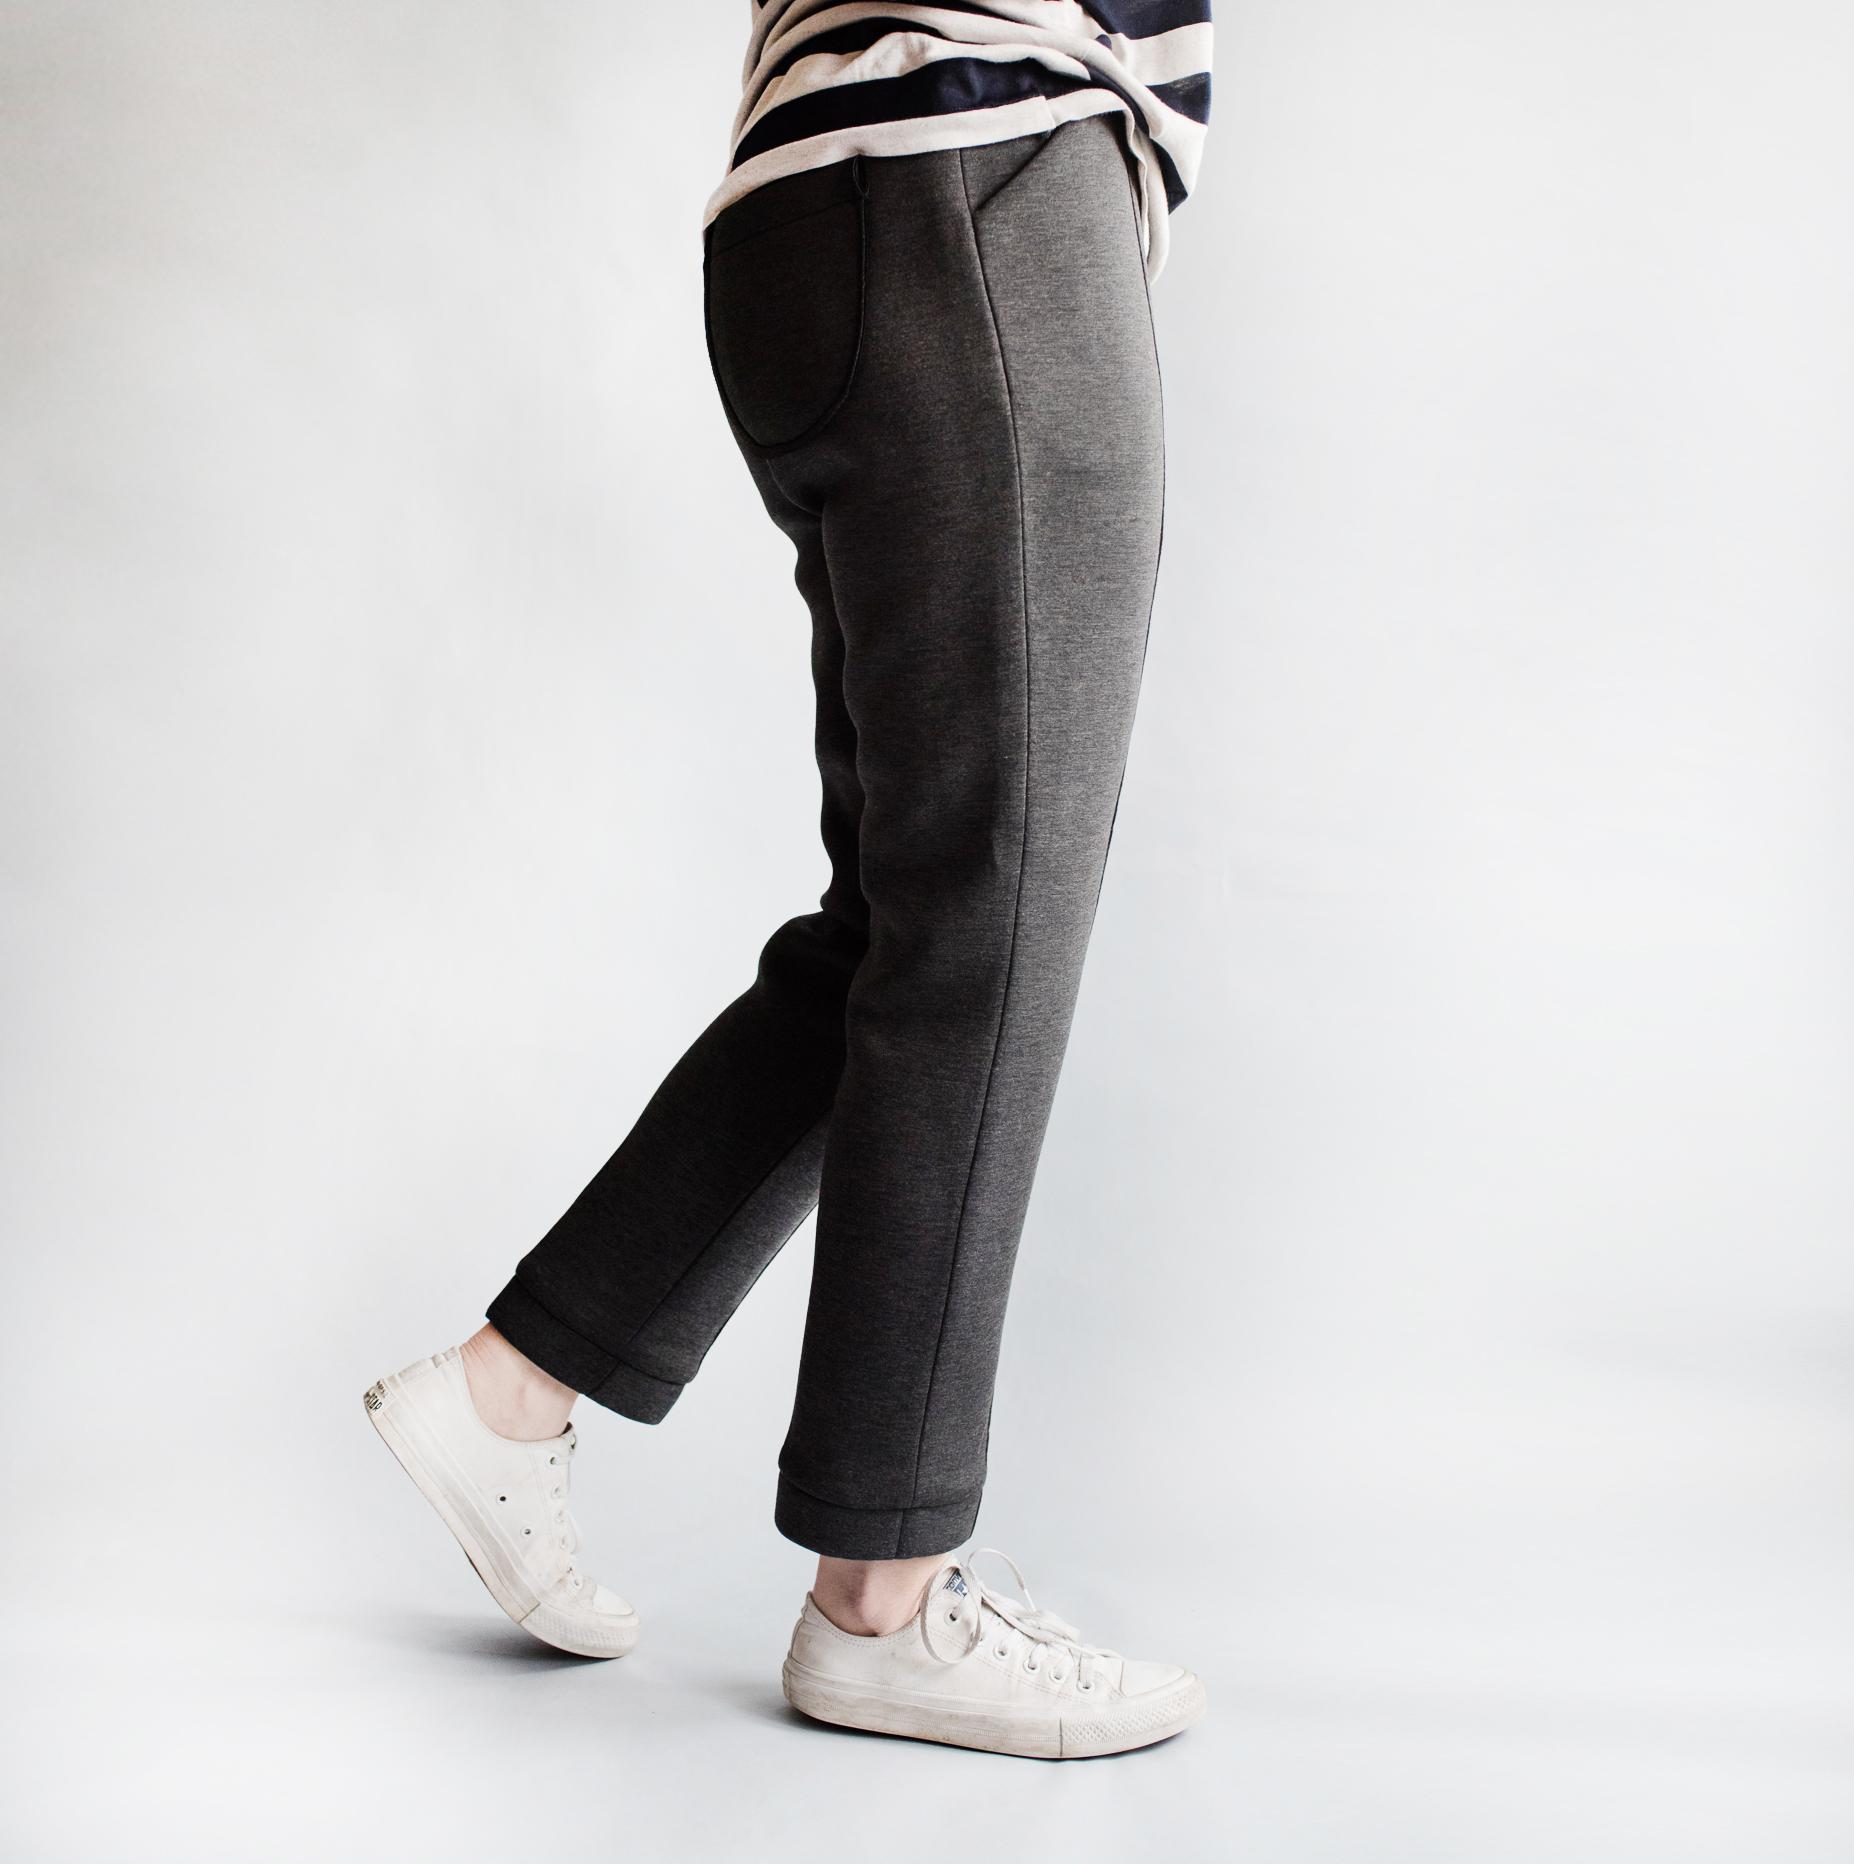 robinson-pdf-sewing-trouser18.jpg